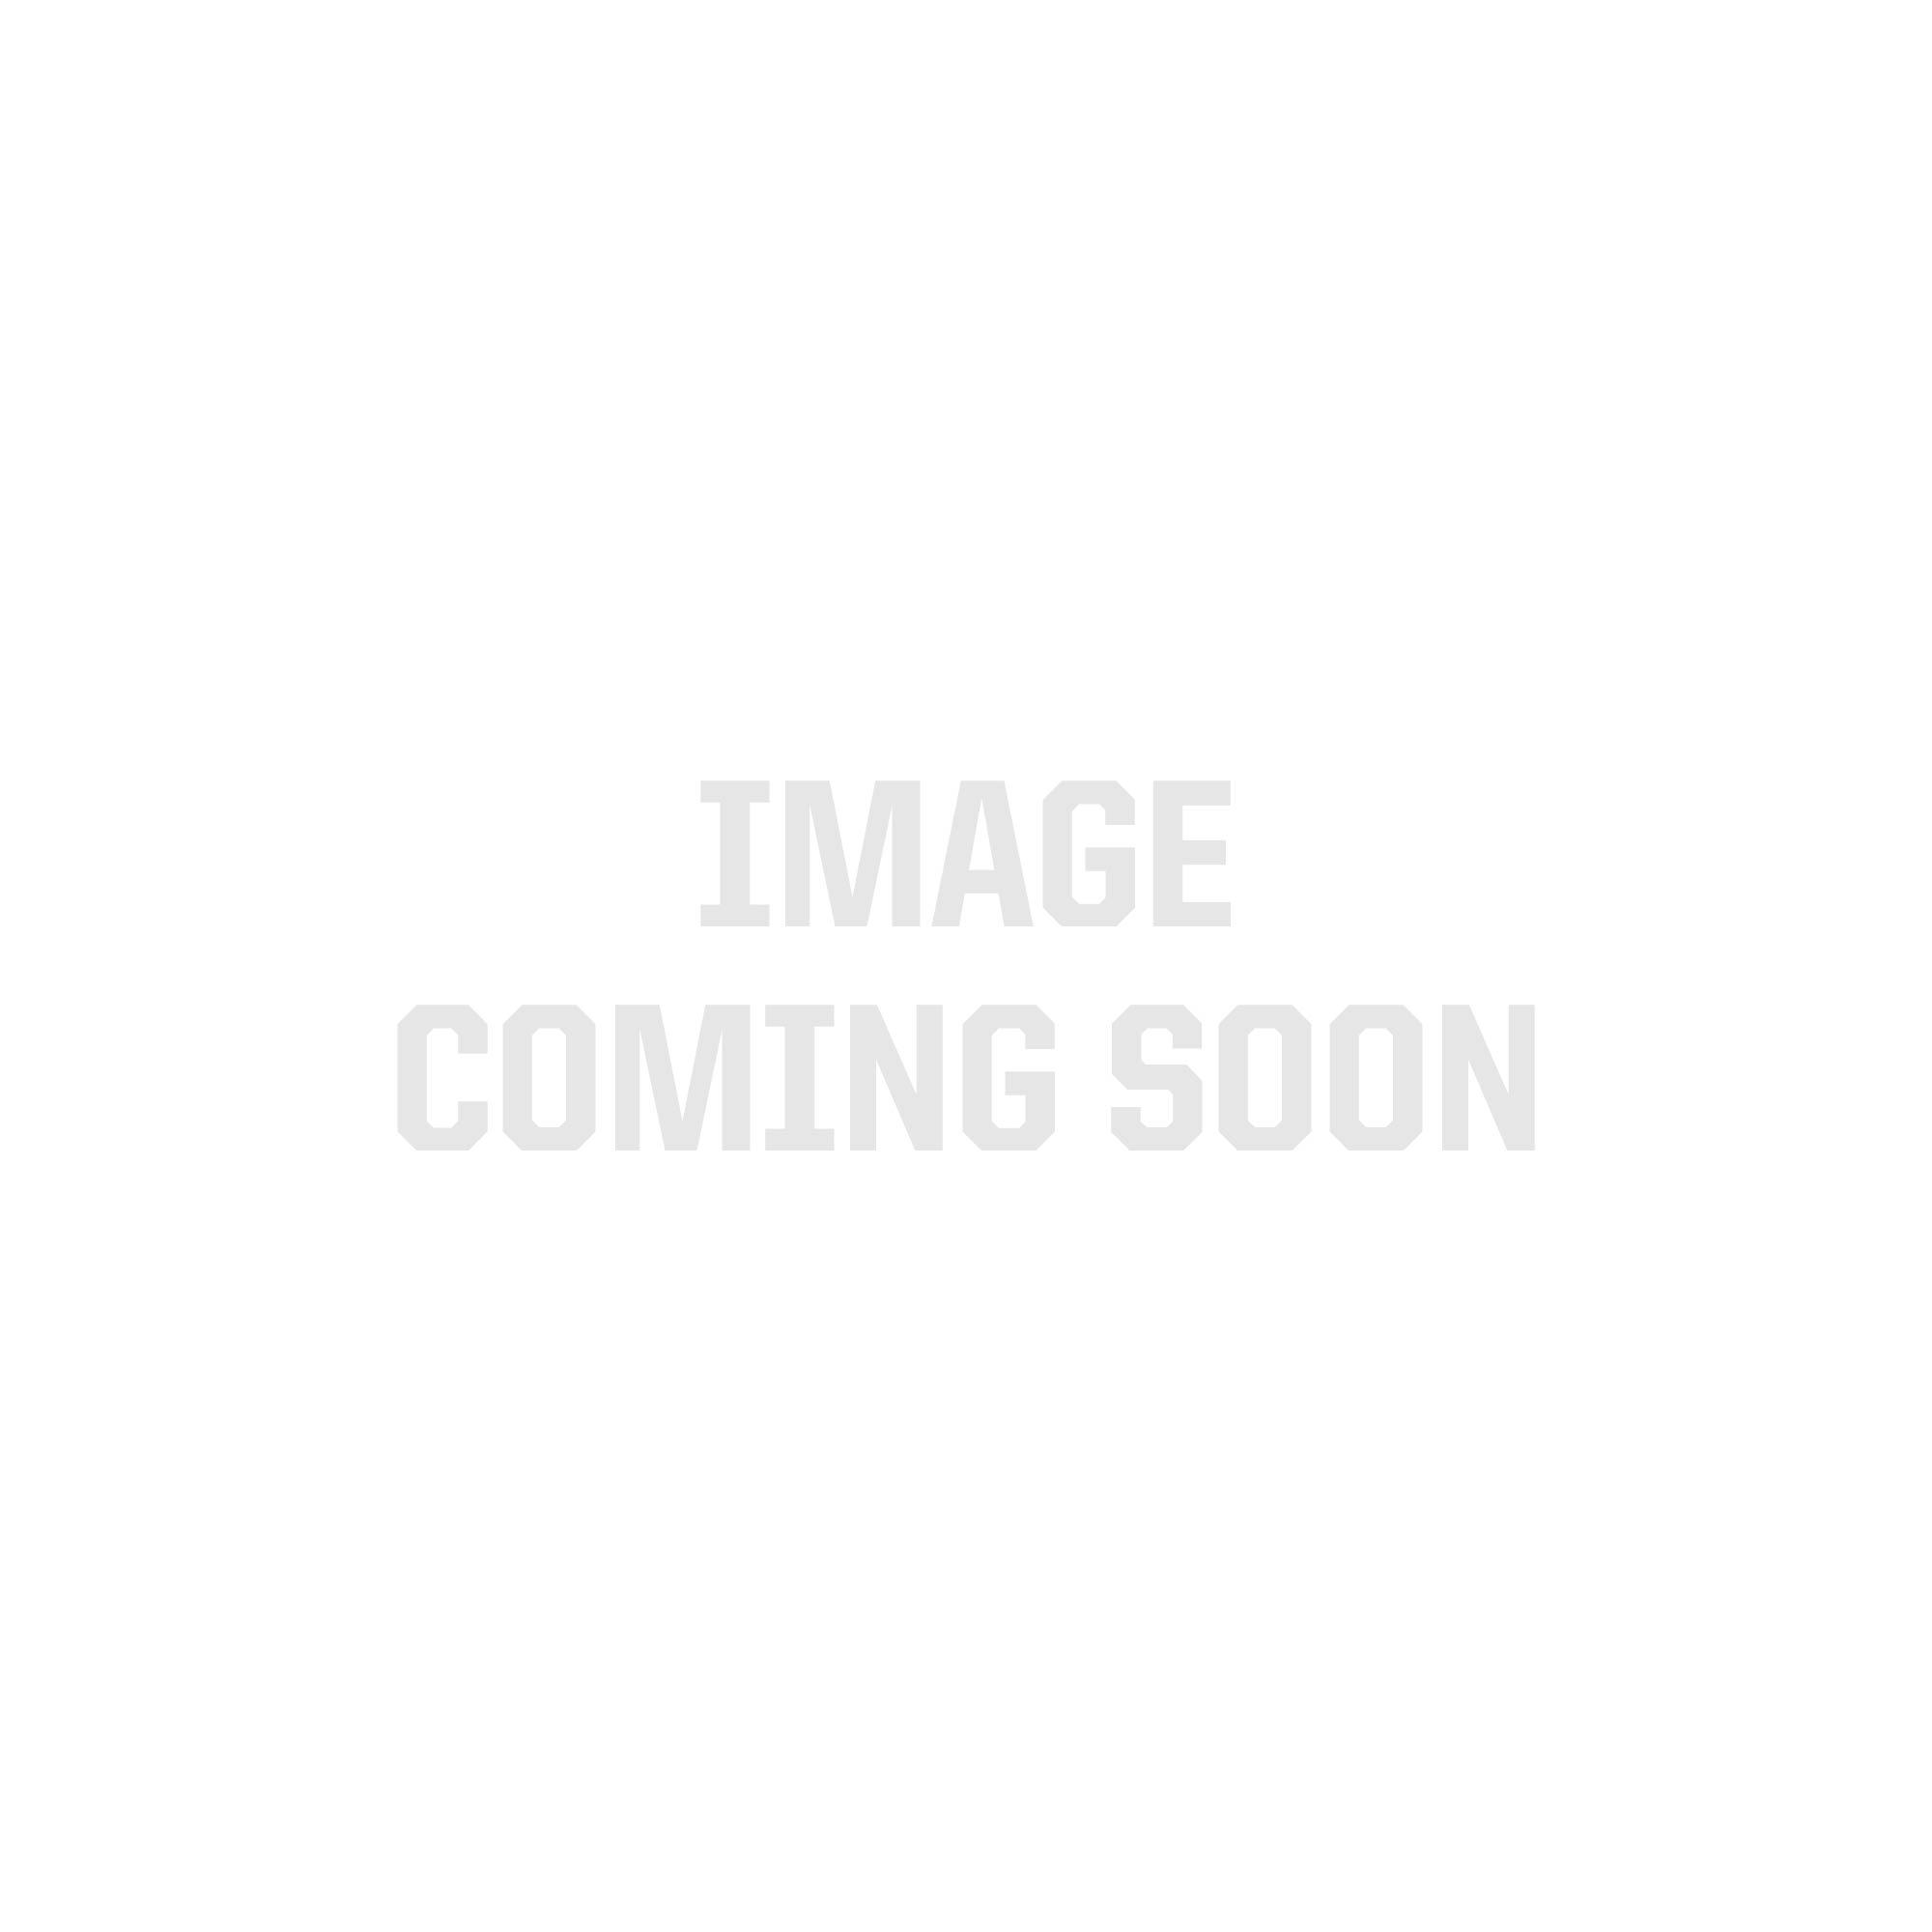 5.11 Tactical Women's TacLite Lightweight Pro Pant | Official 5.11 ...